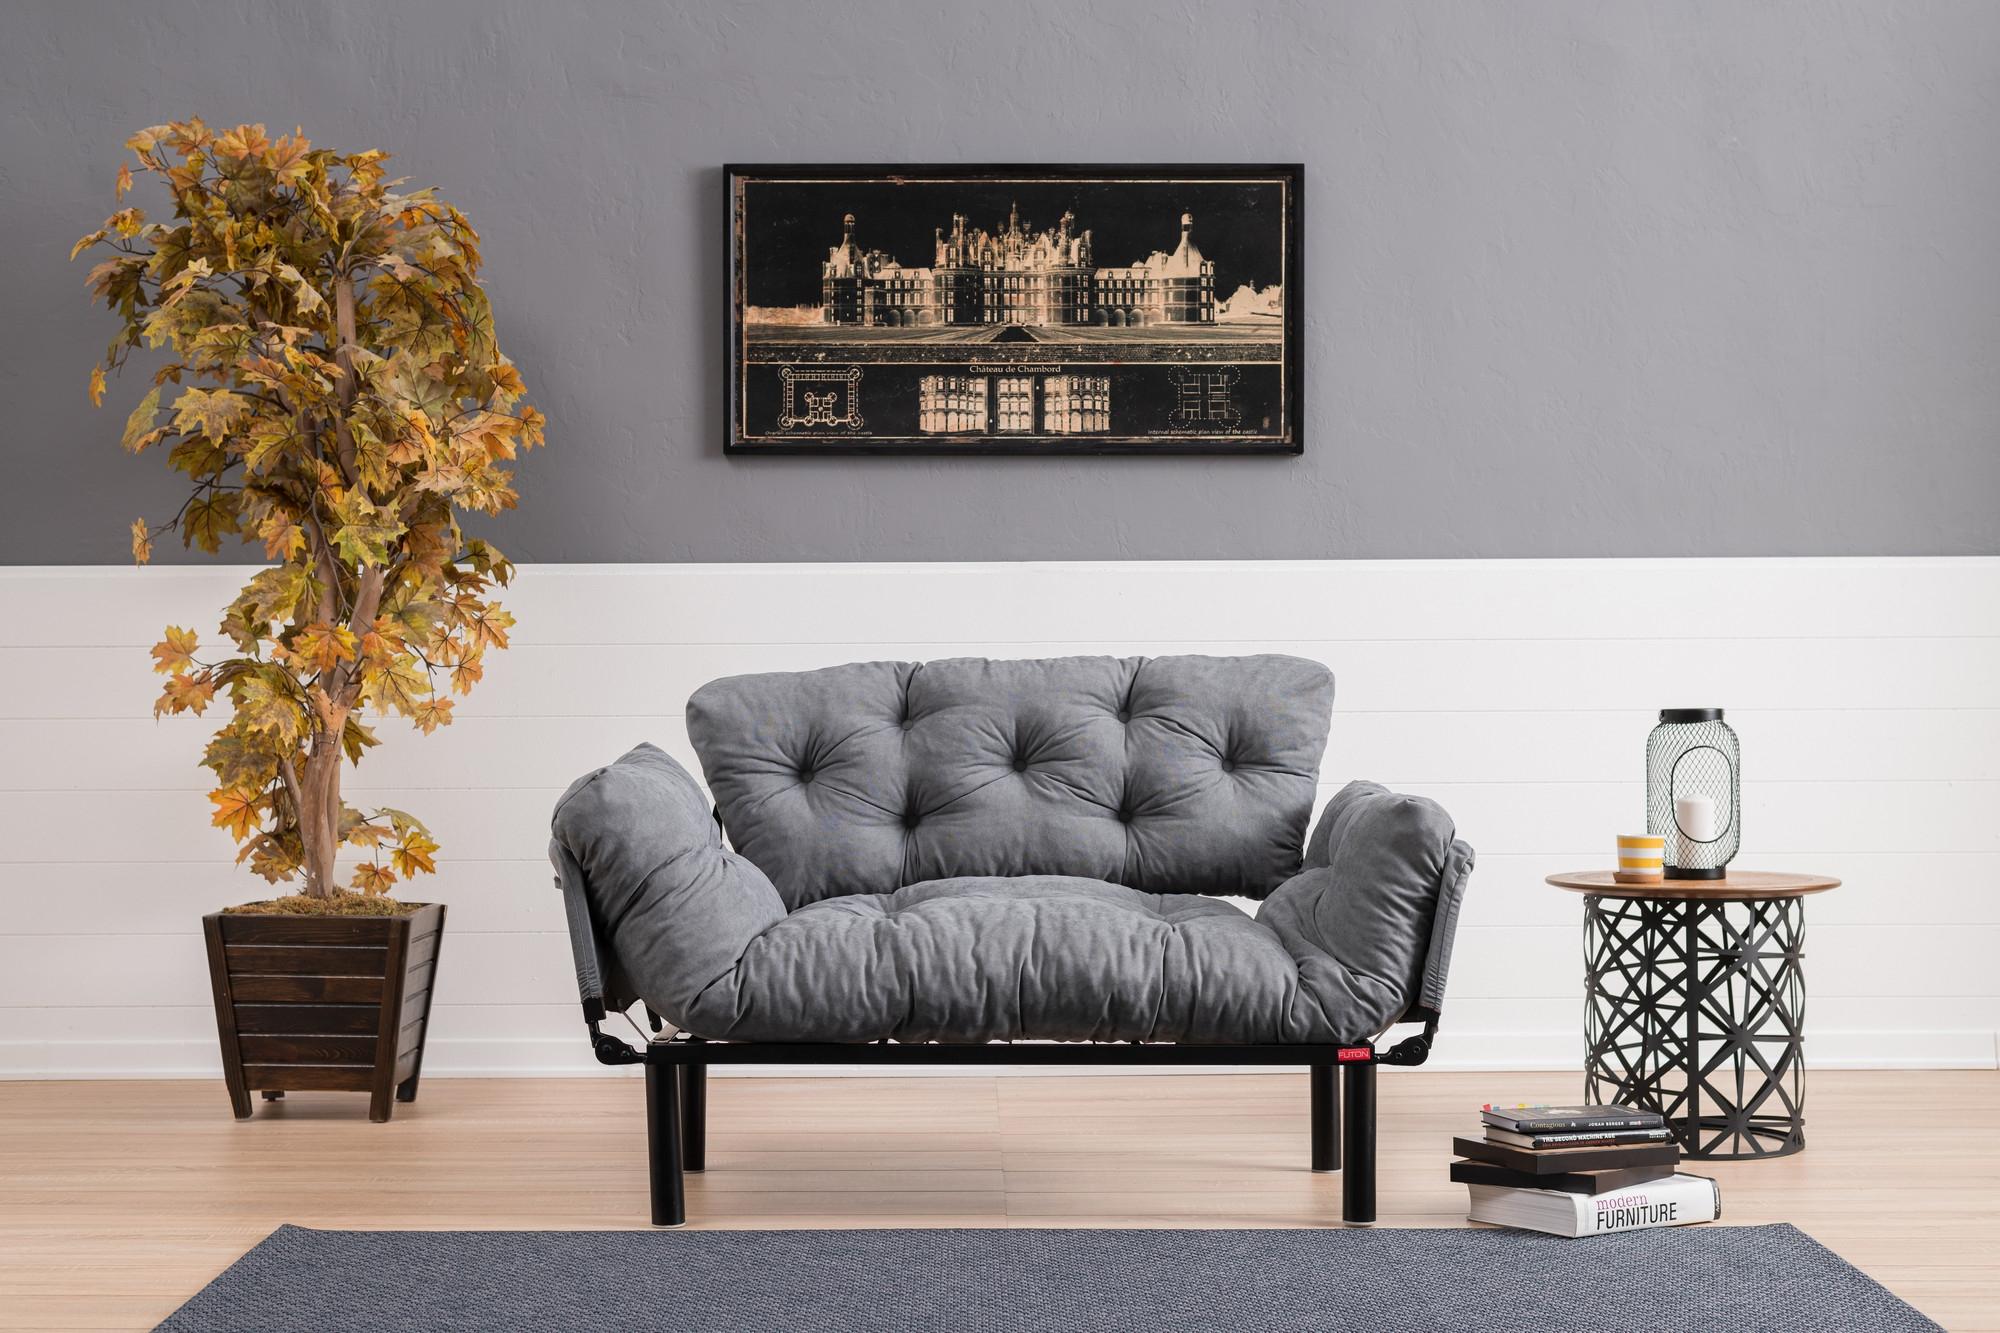 Canapea pentru terasa, stofa si cadru metalic, 2 locuri Nita Gri, l155xA70xH85 cm somproduct.ro